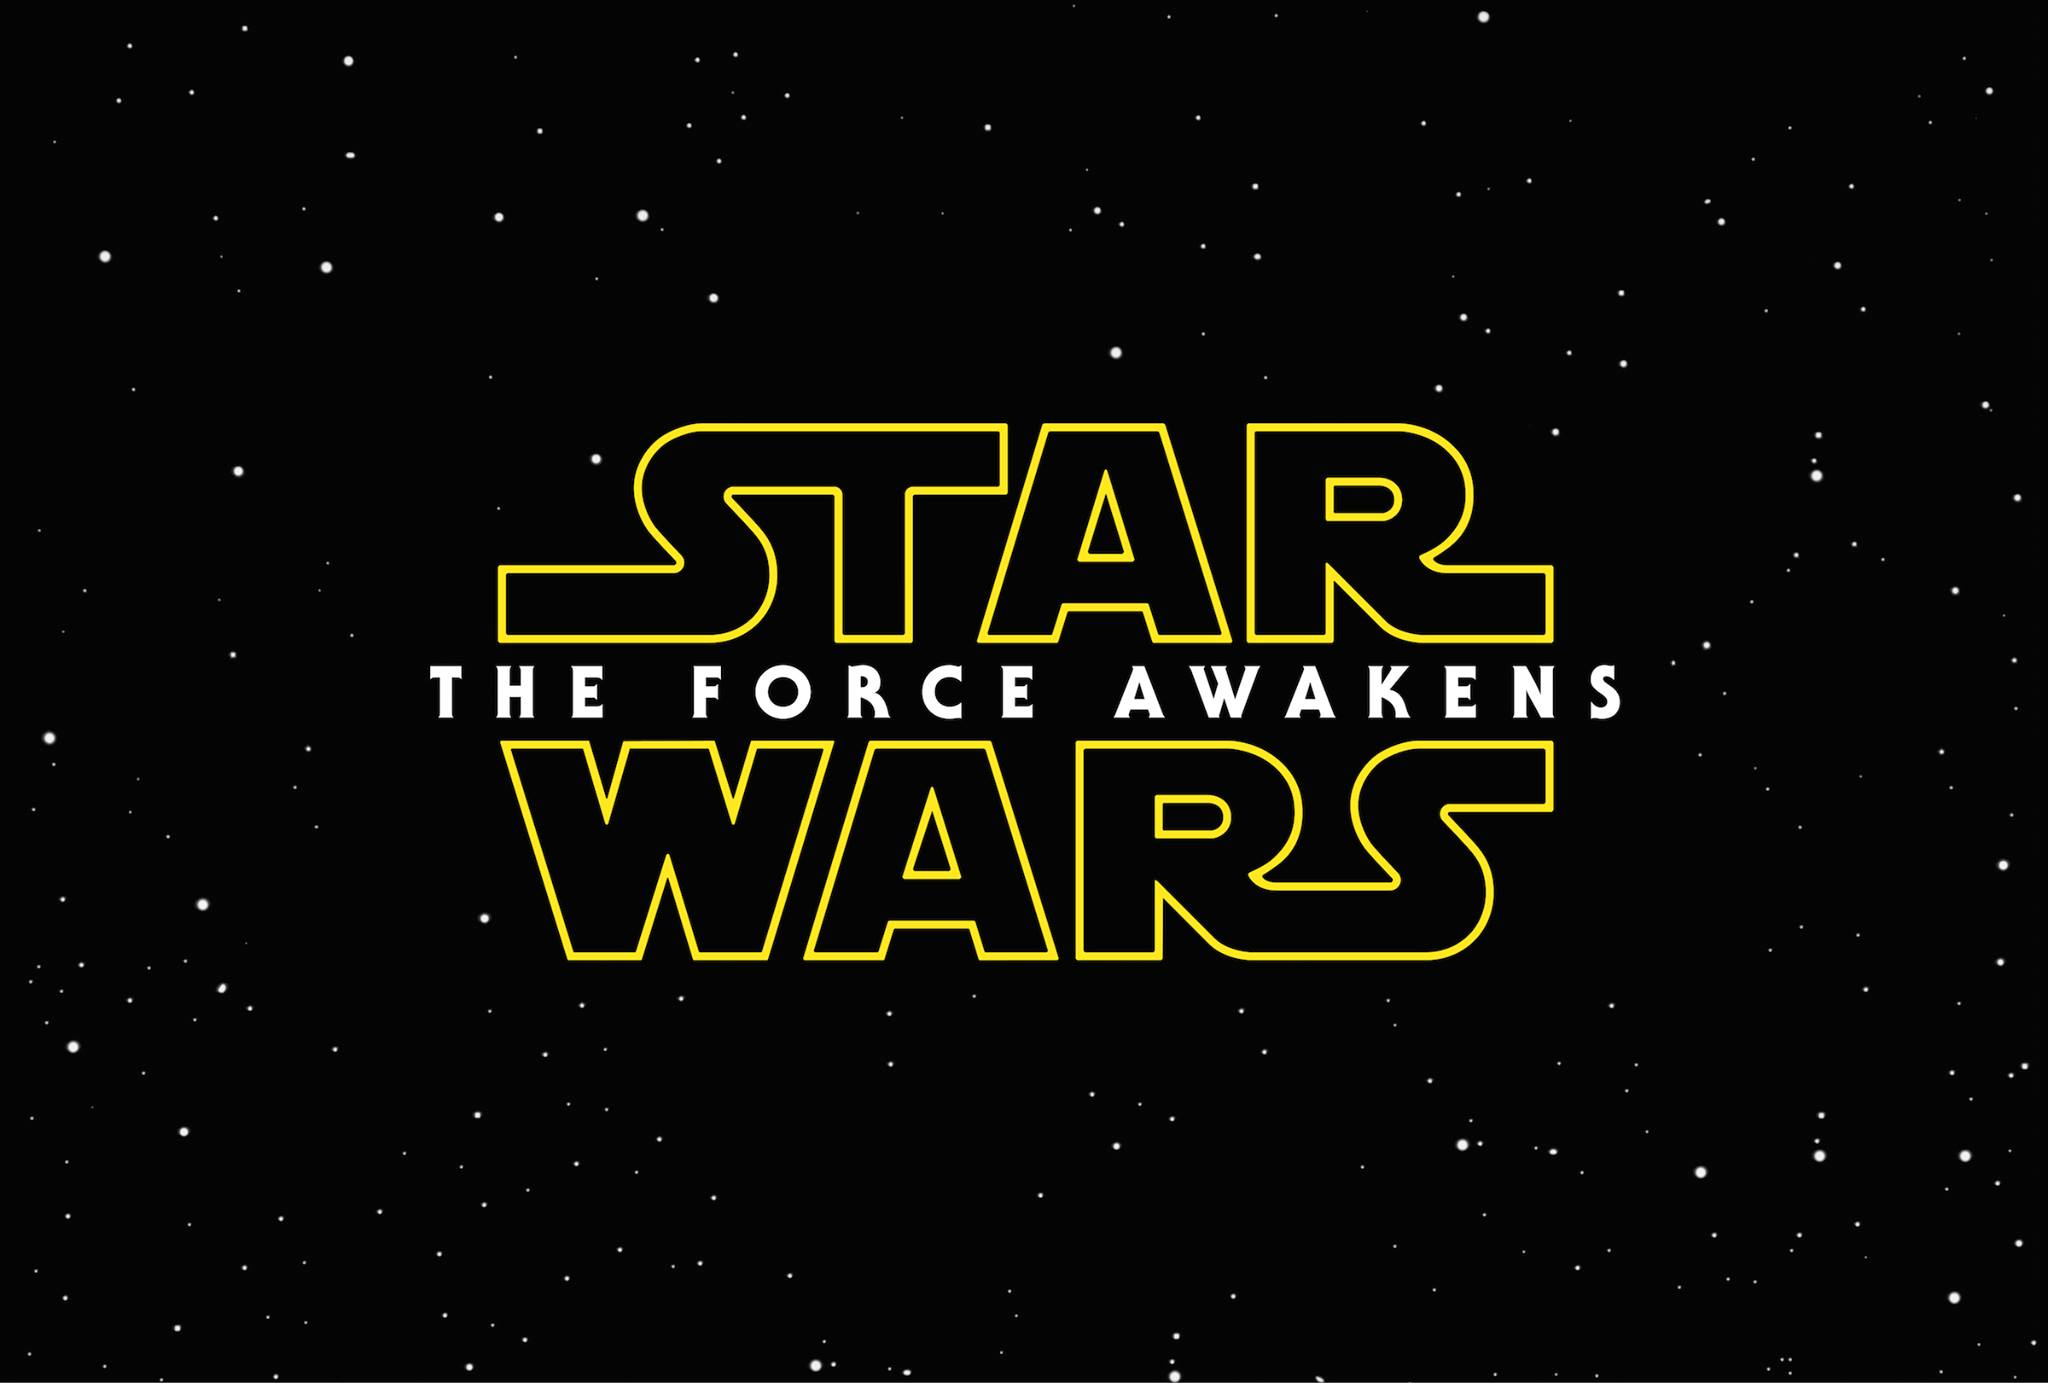 Star Wars - The Force Awakens.jpg